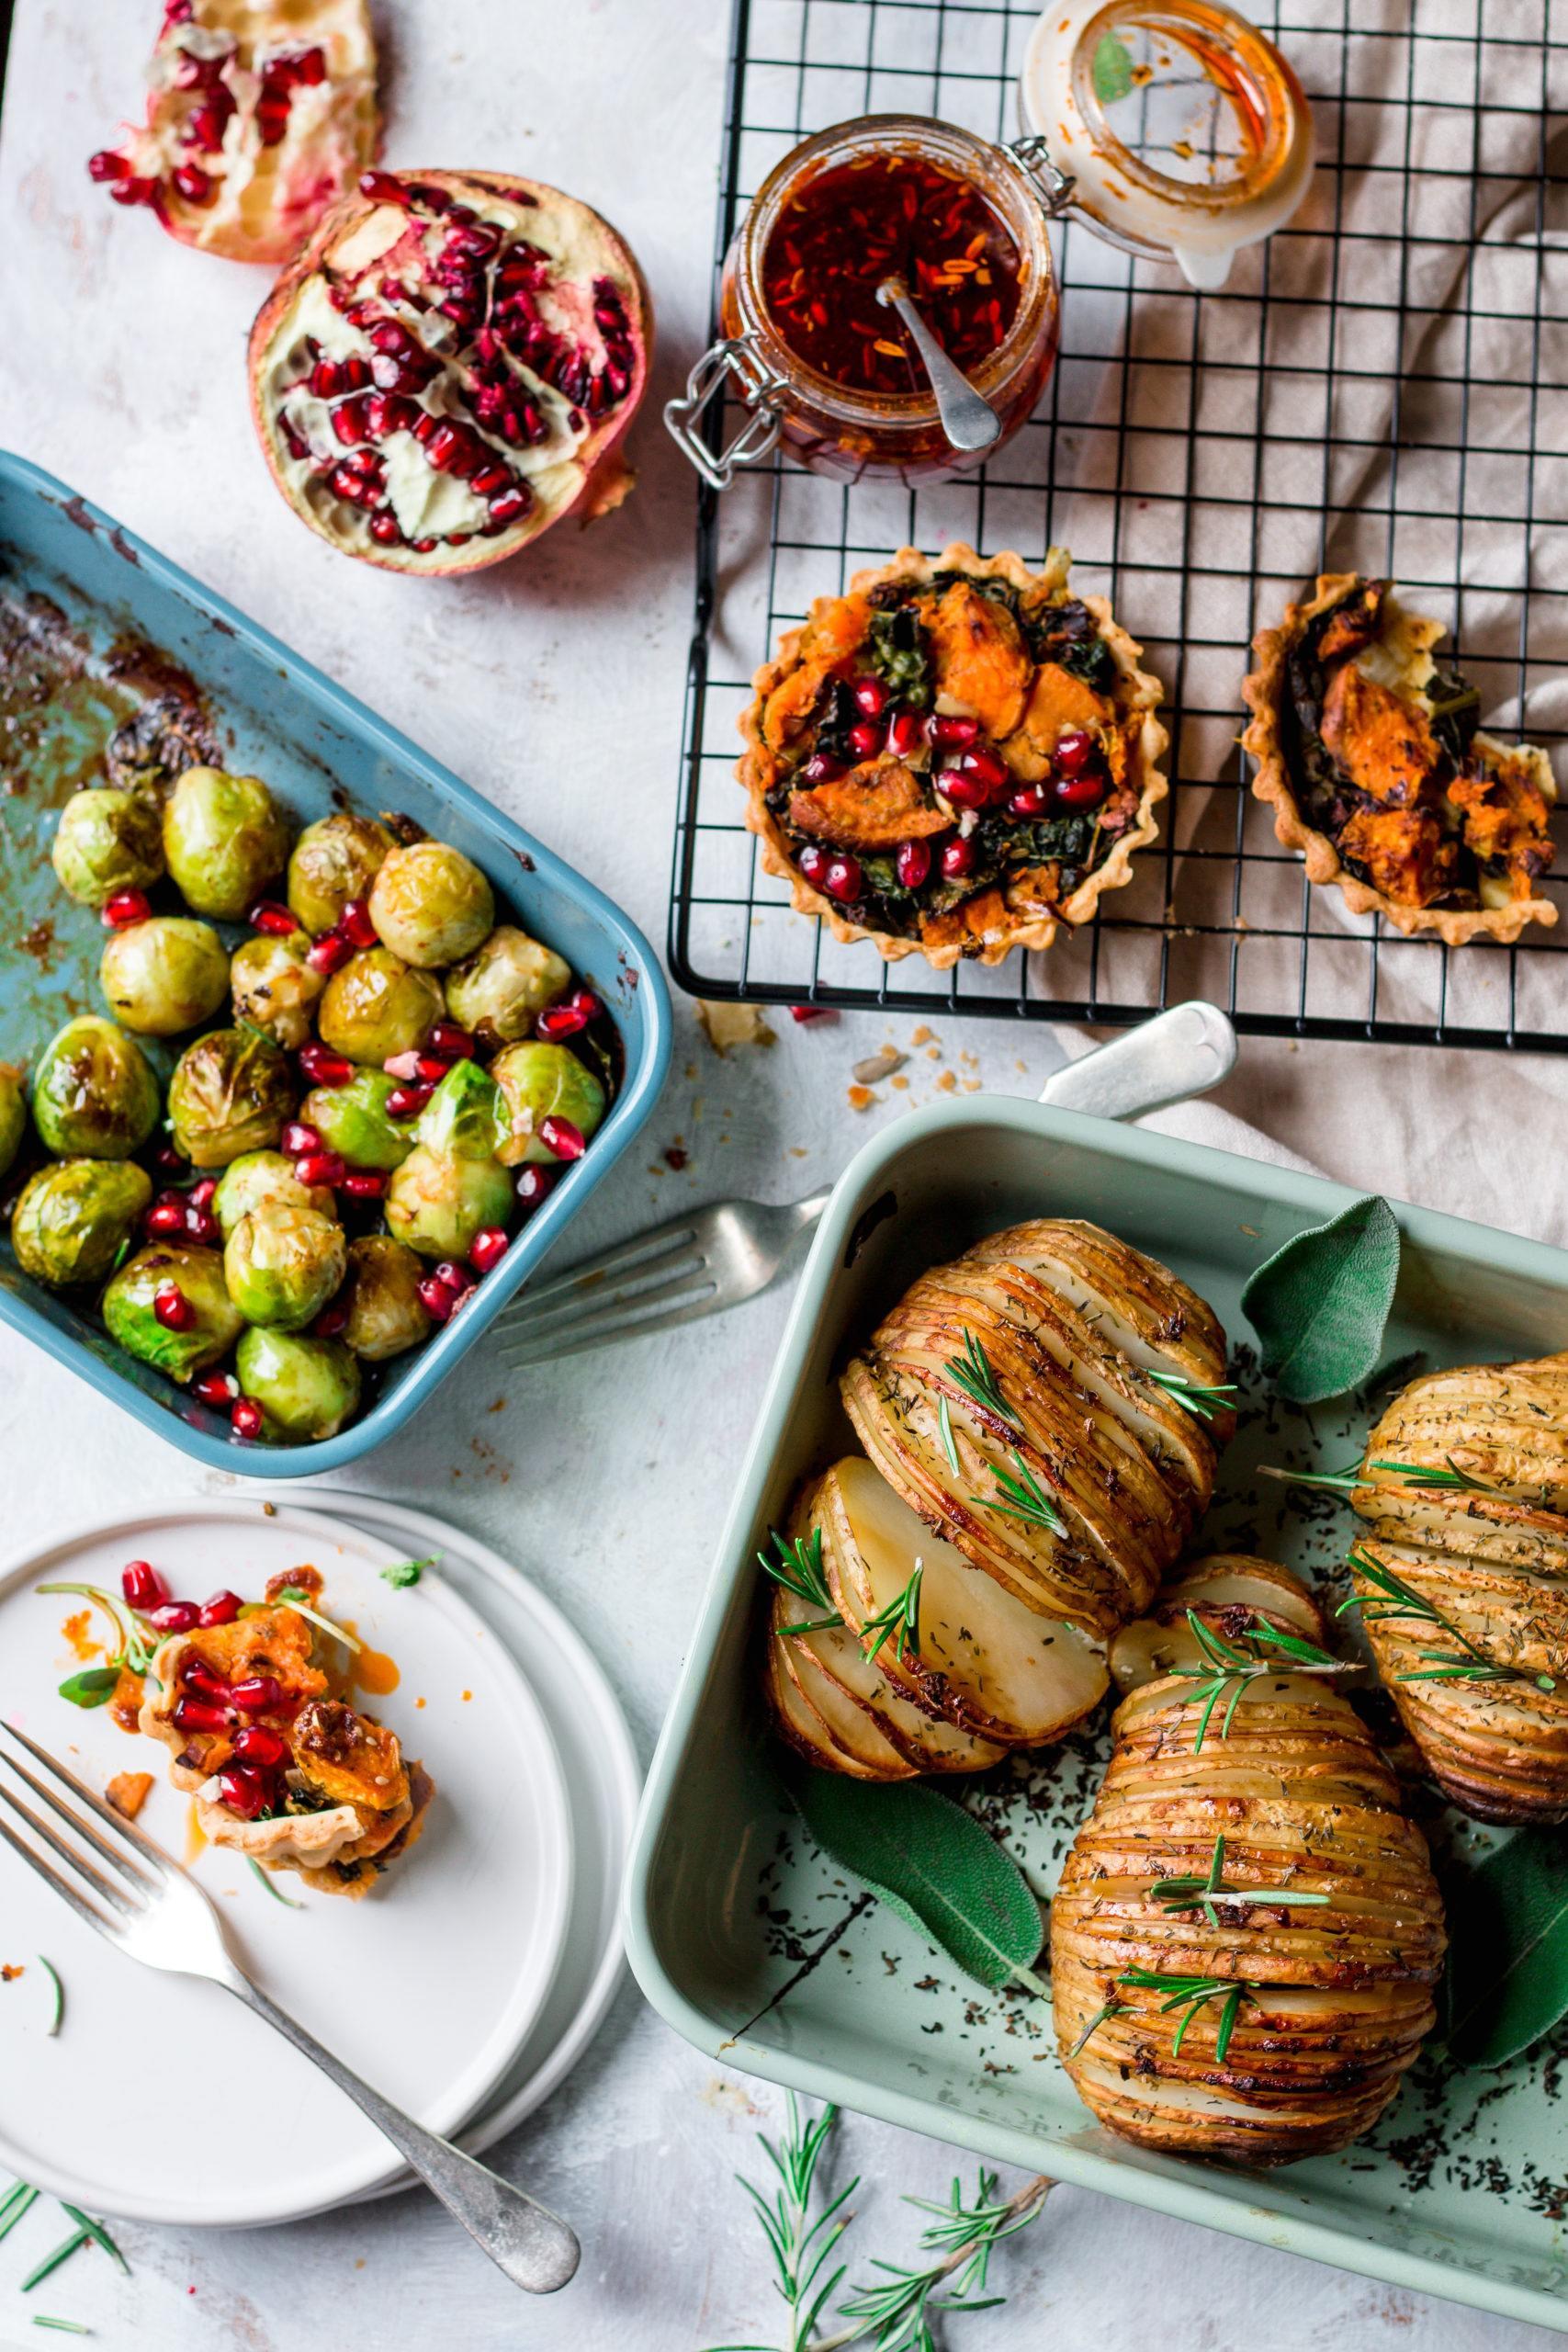 Vegan christmas meal idea